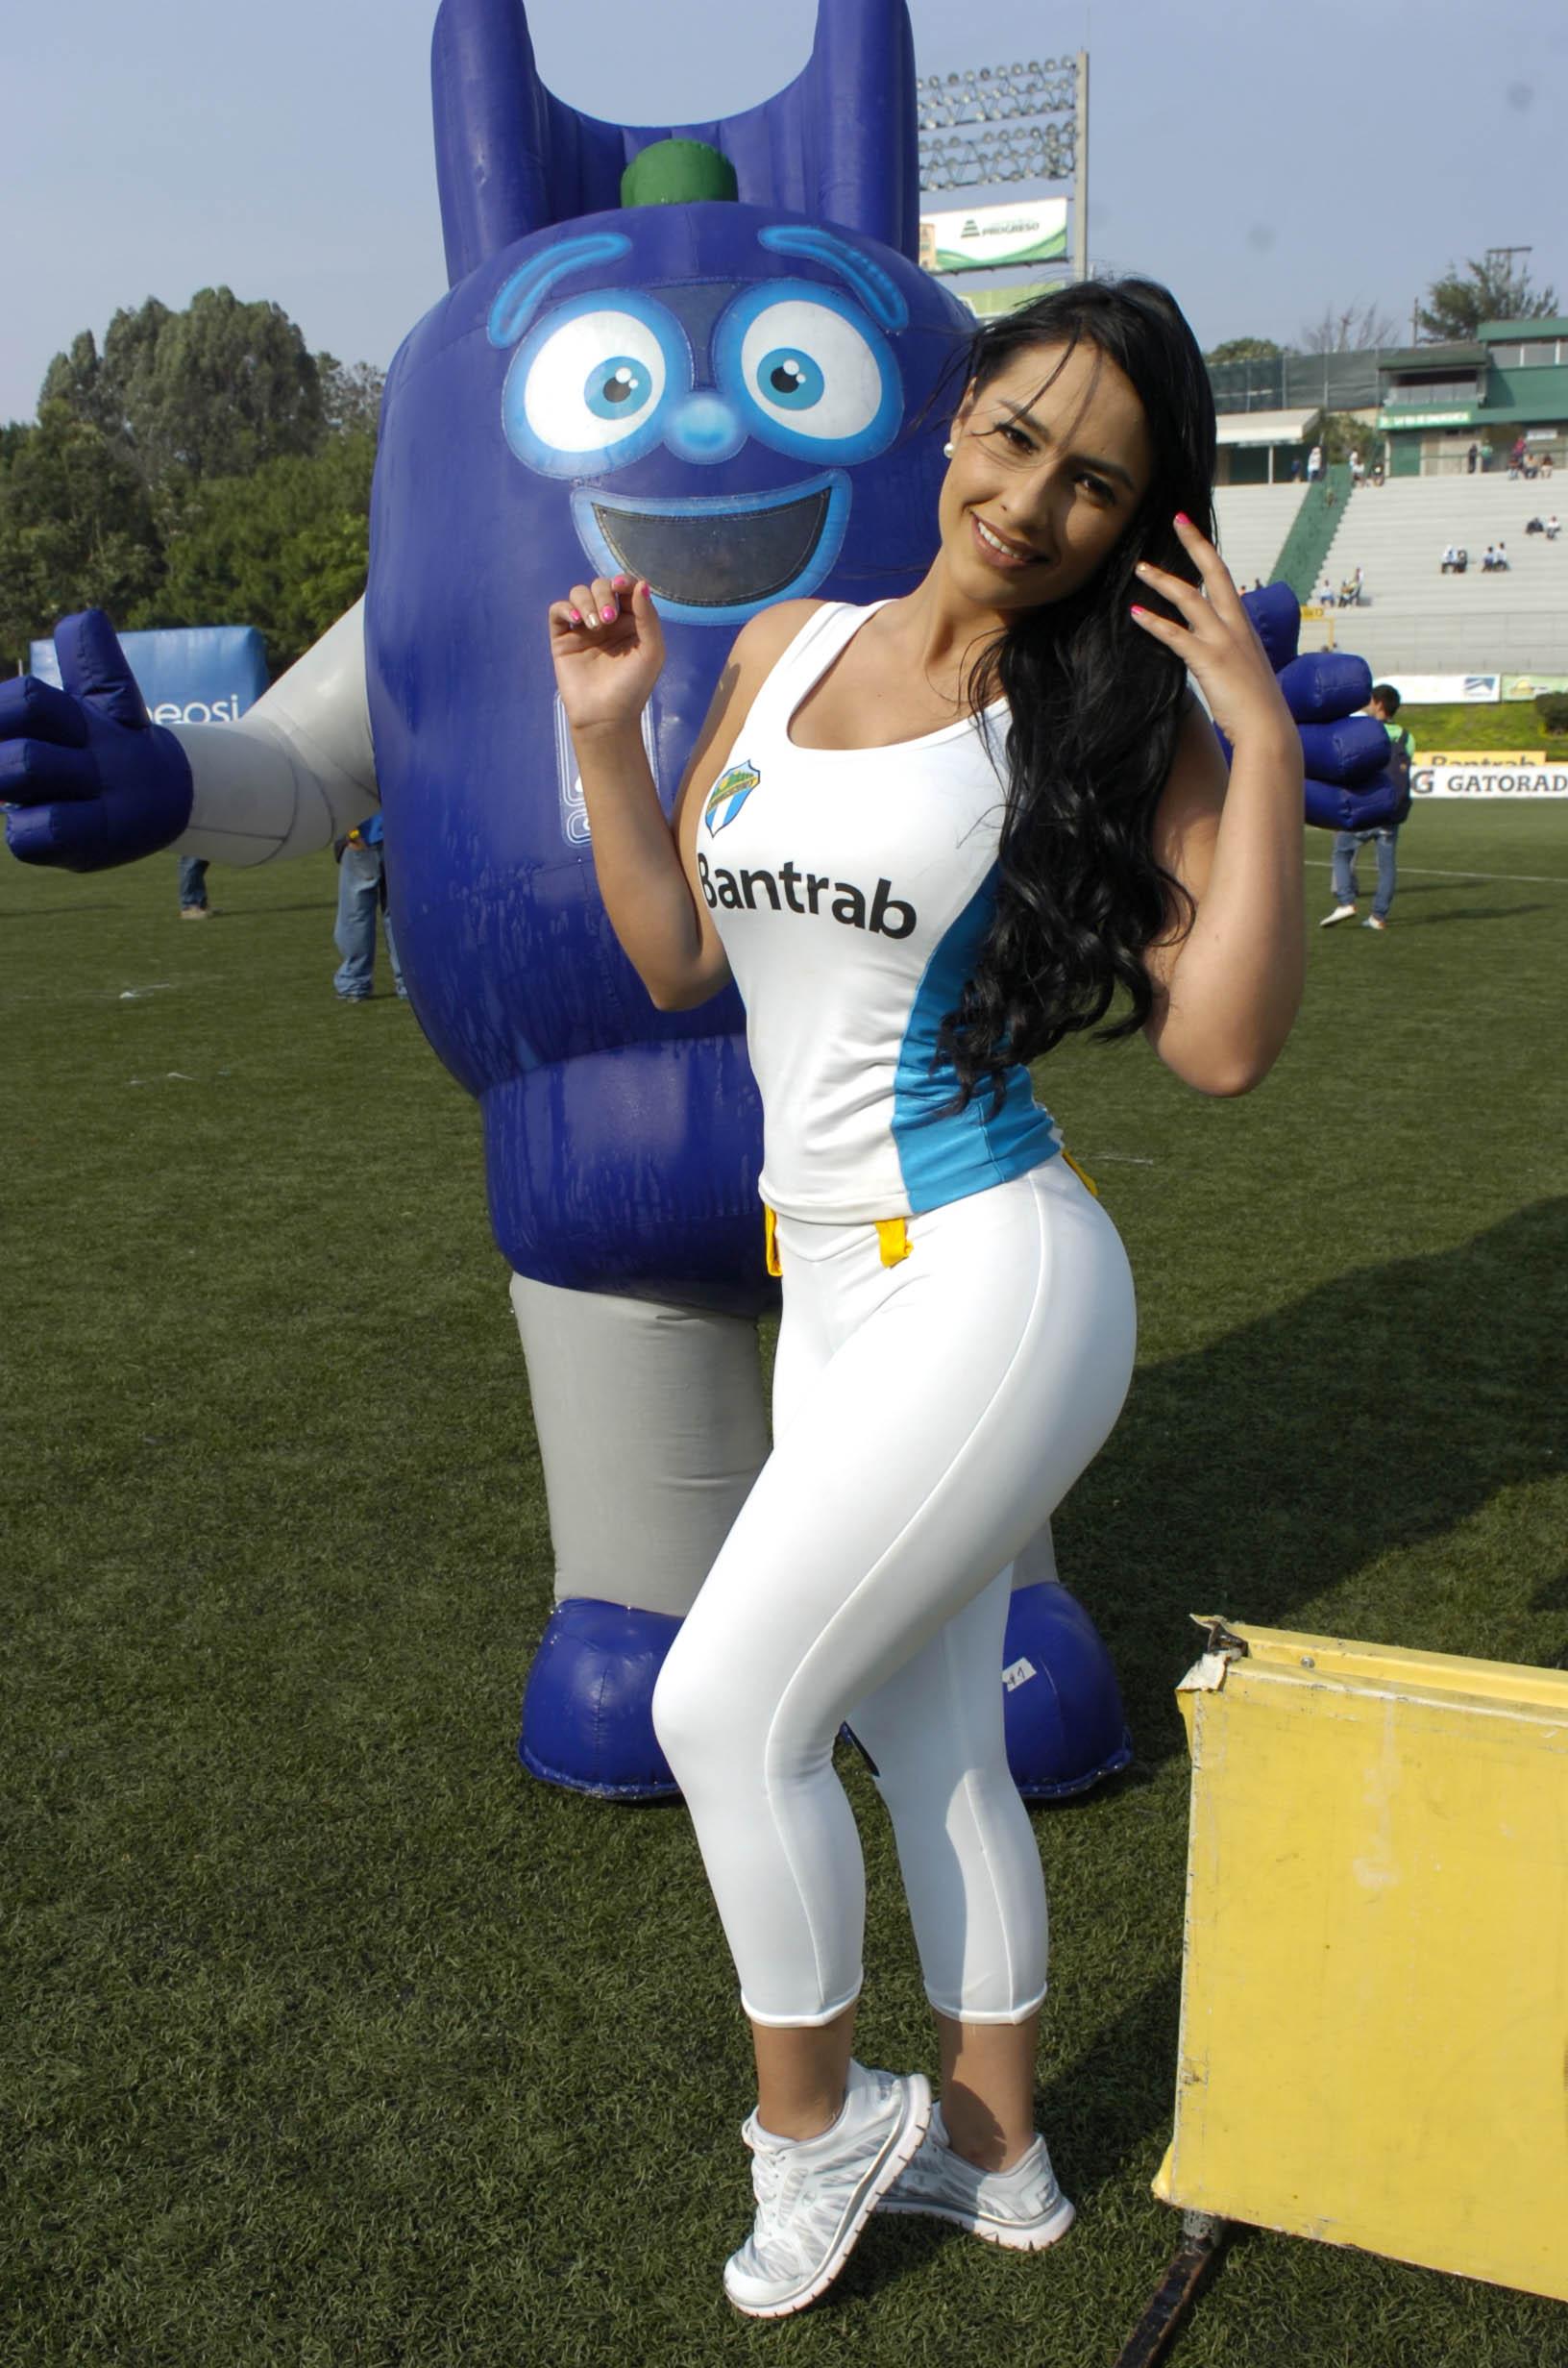 estefani-robles-de-venezuela-4160